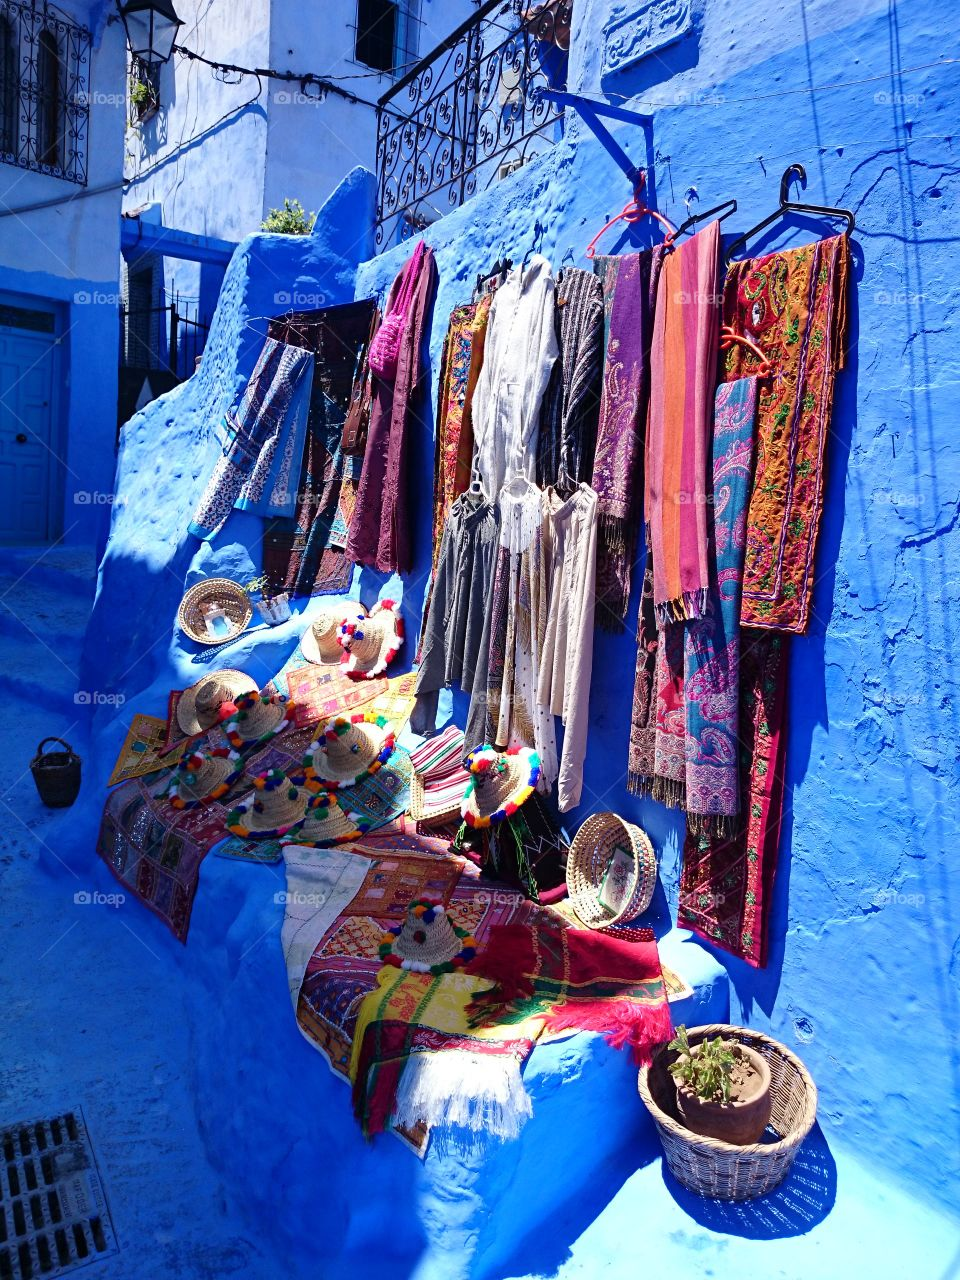 Street market in chefchaouen